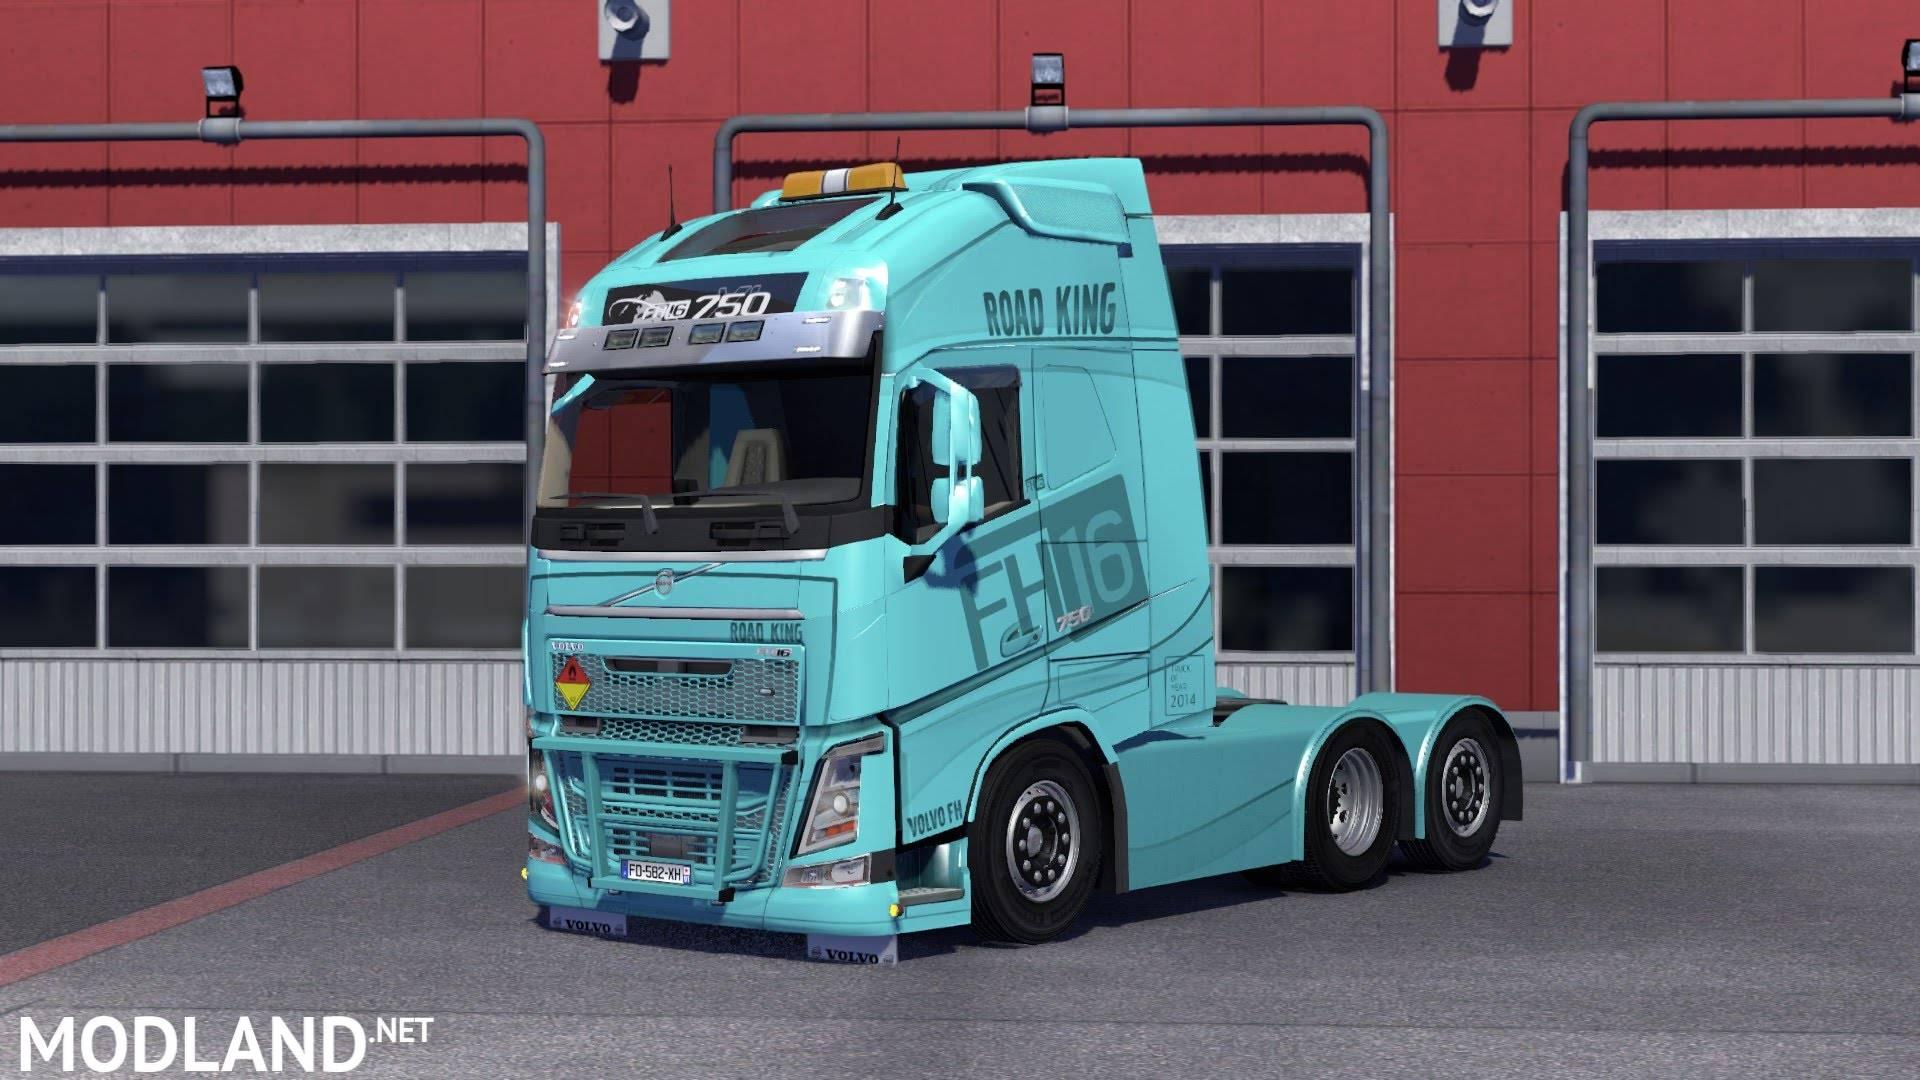 Volvo FH 2013 [ohaha] v20.14s mod for ETS 2